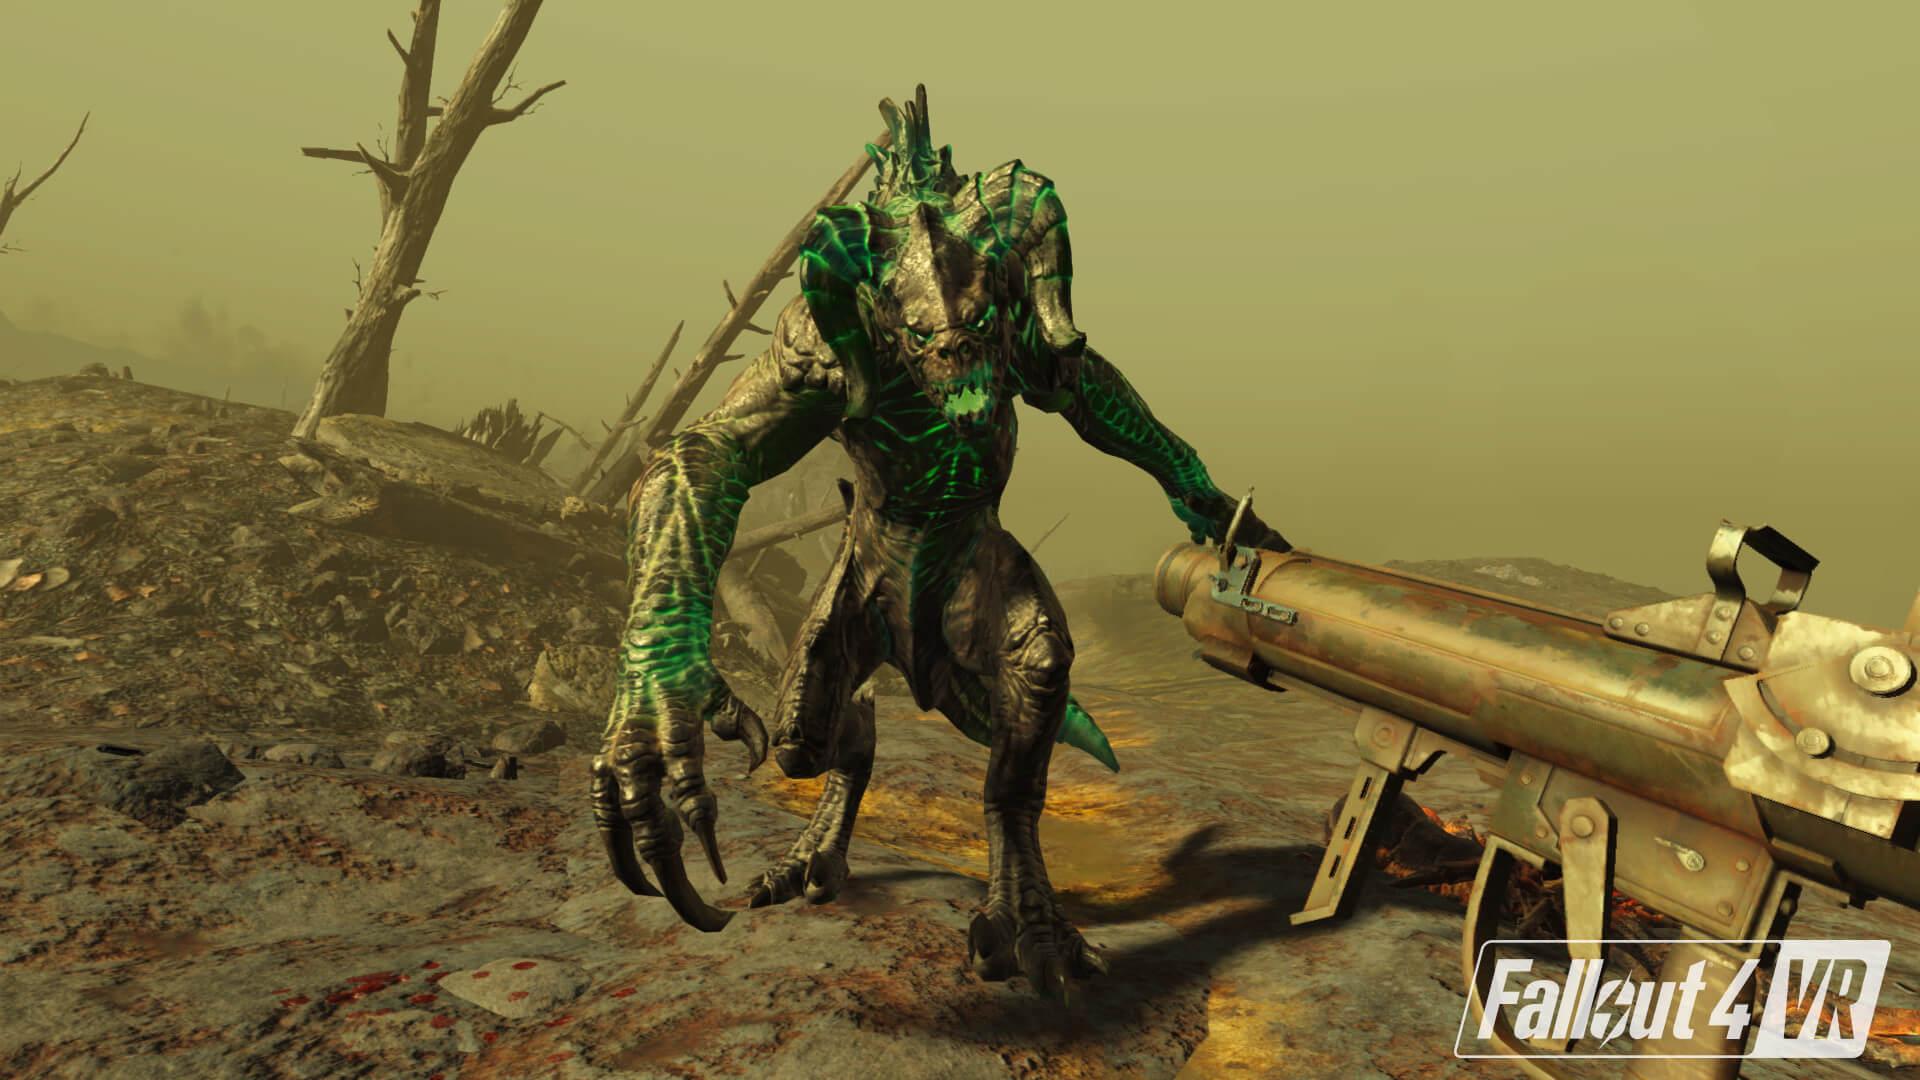 Fallout 4 VR Oyun